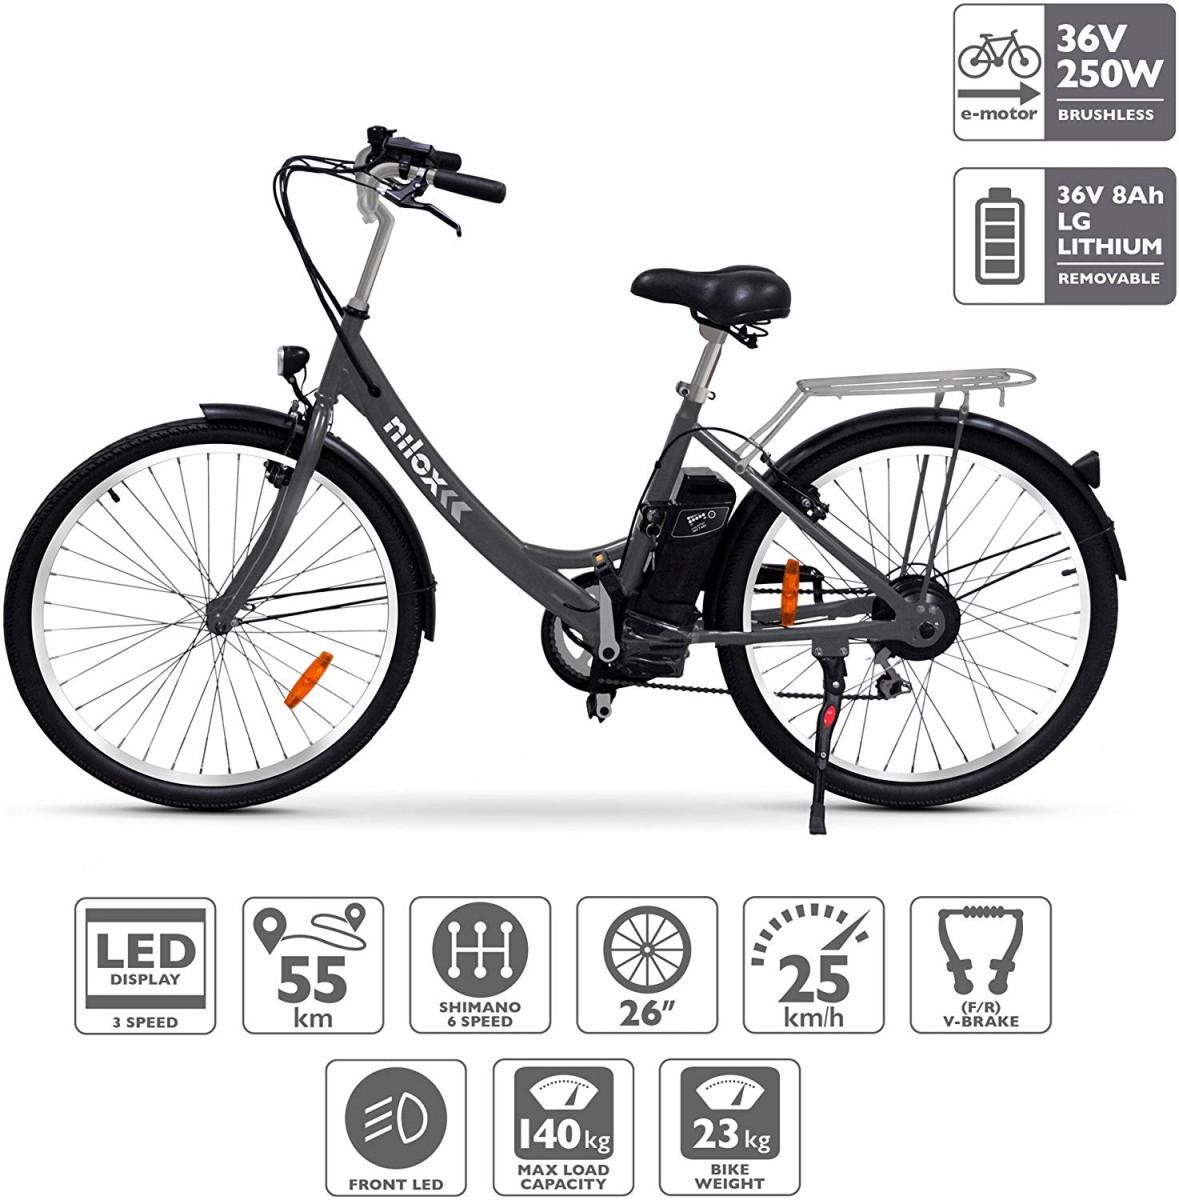 Nilox-E-Bike-X5 Nilox E Bike X5